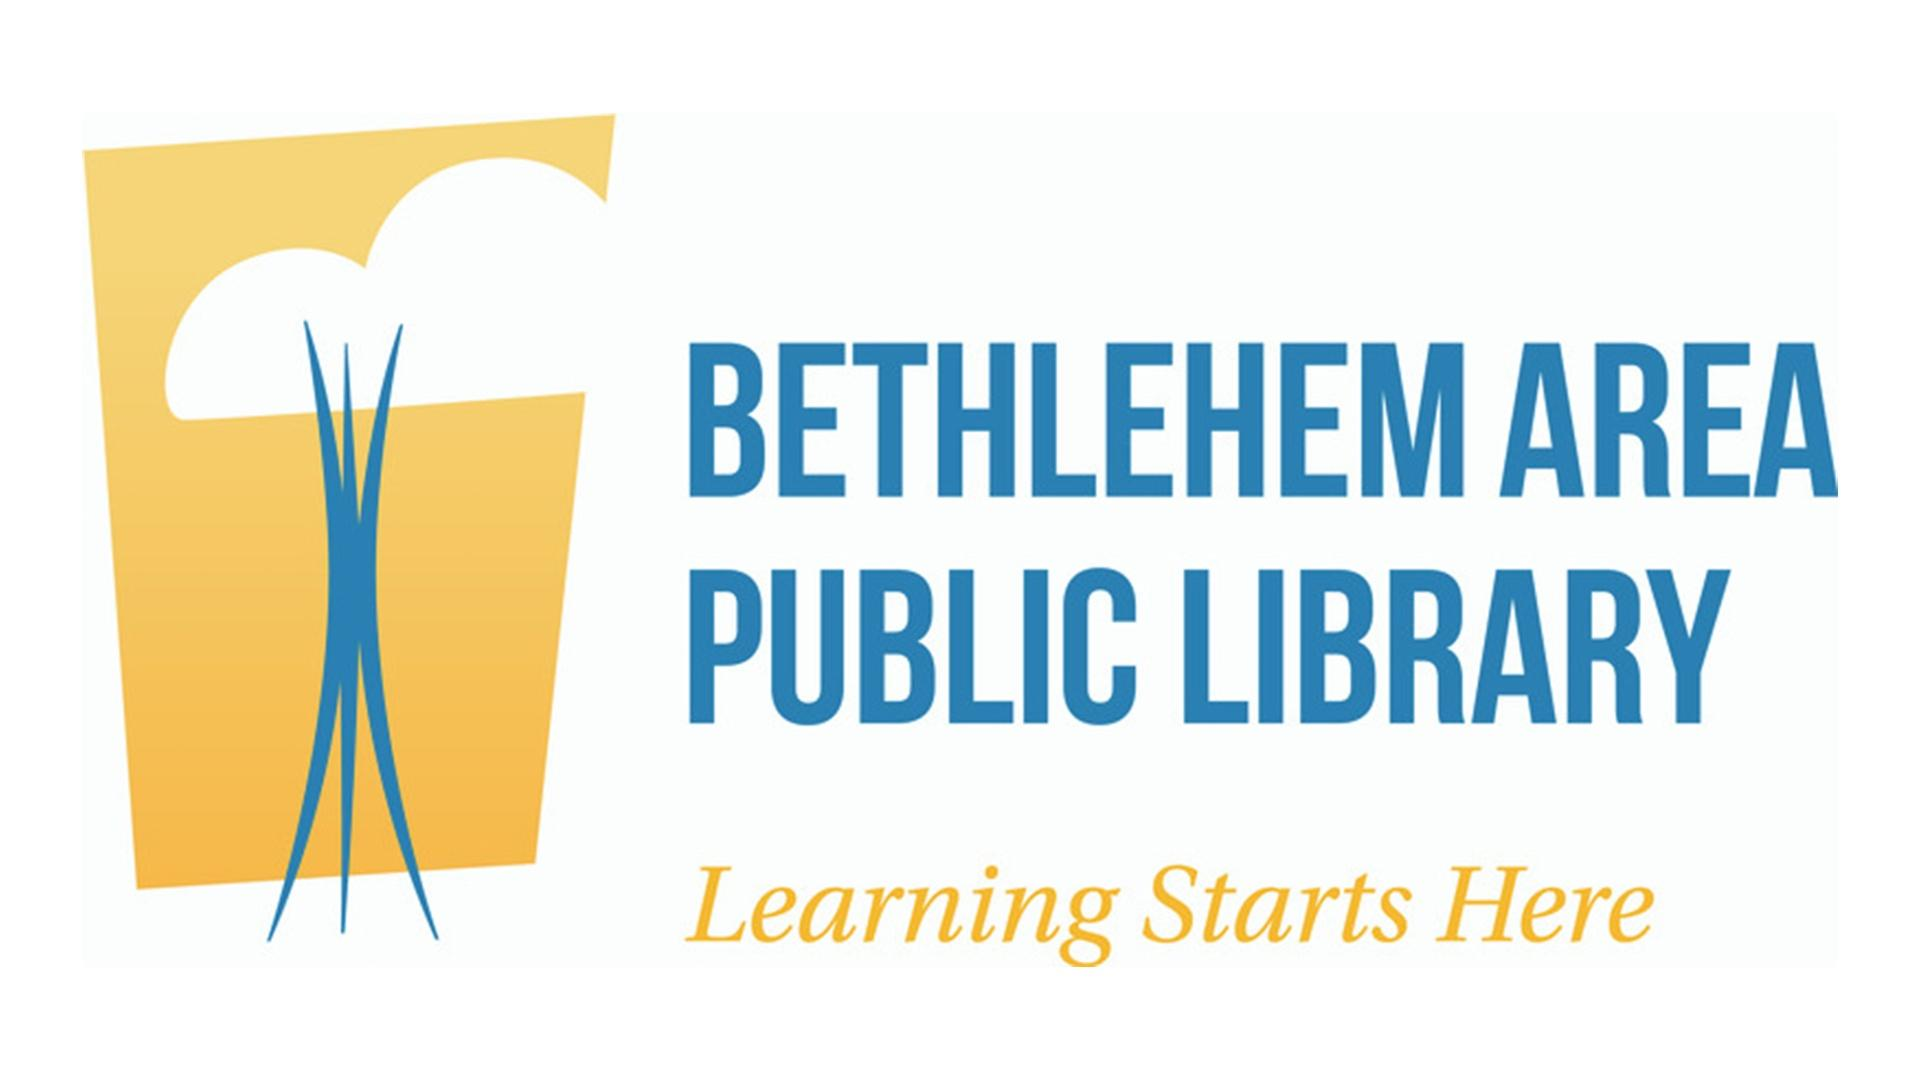 Bethlehem Area Public Library - Learning Starts Here